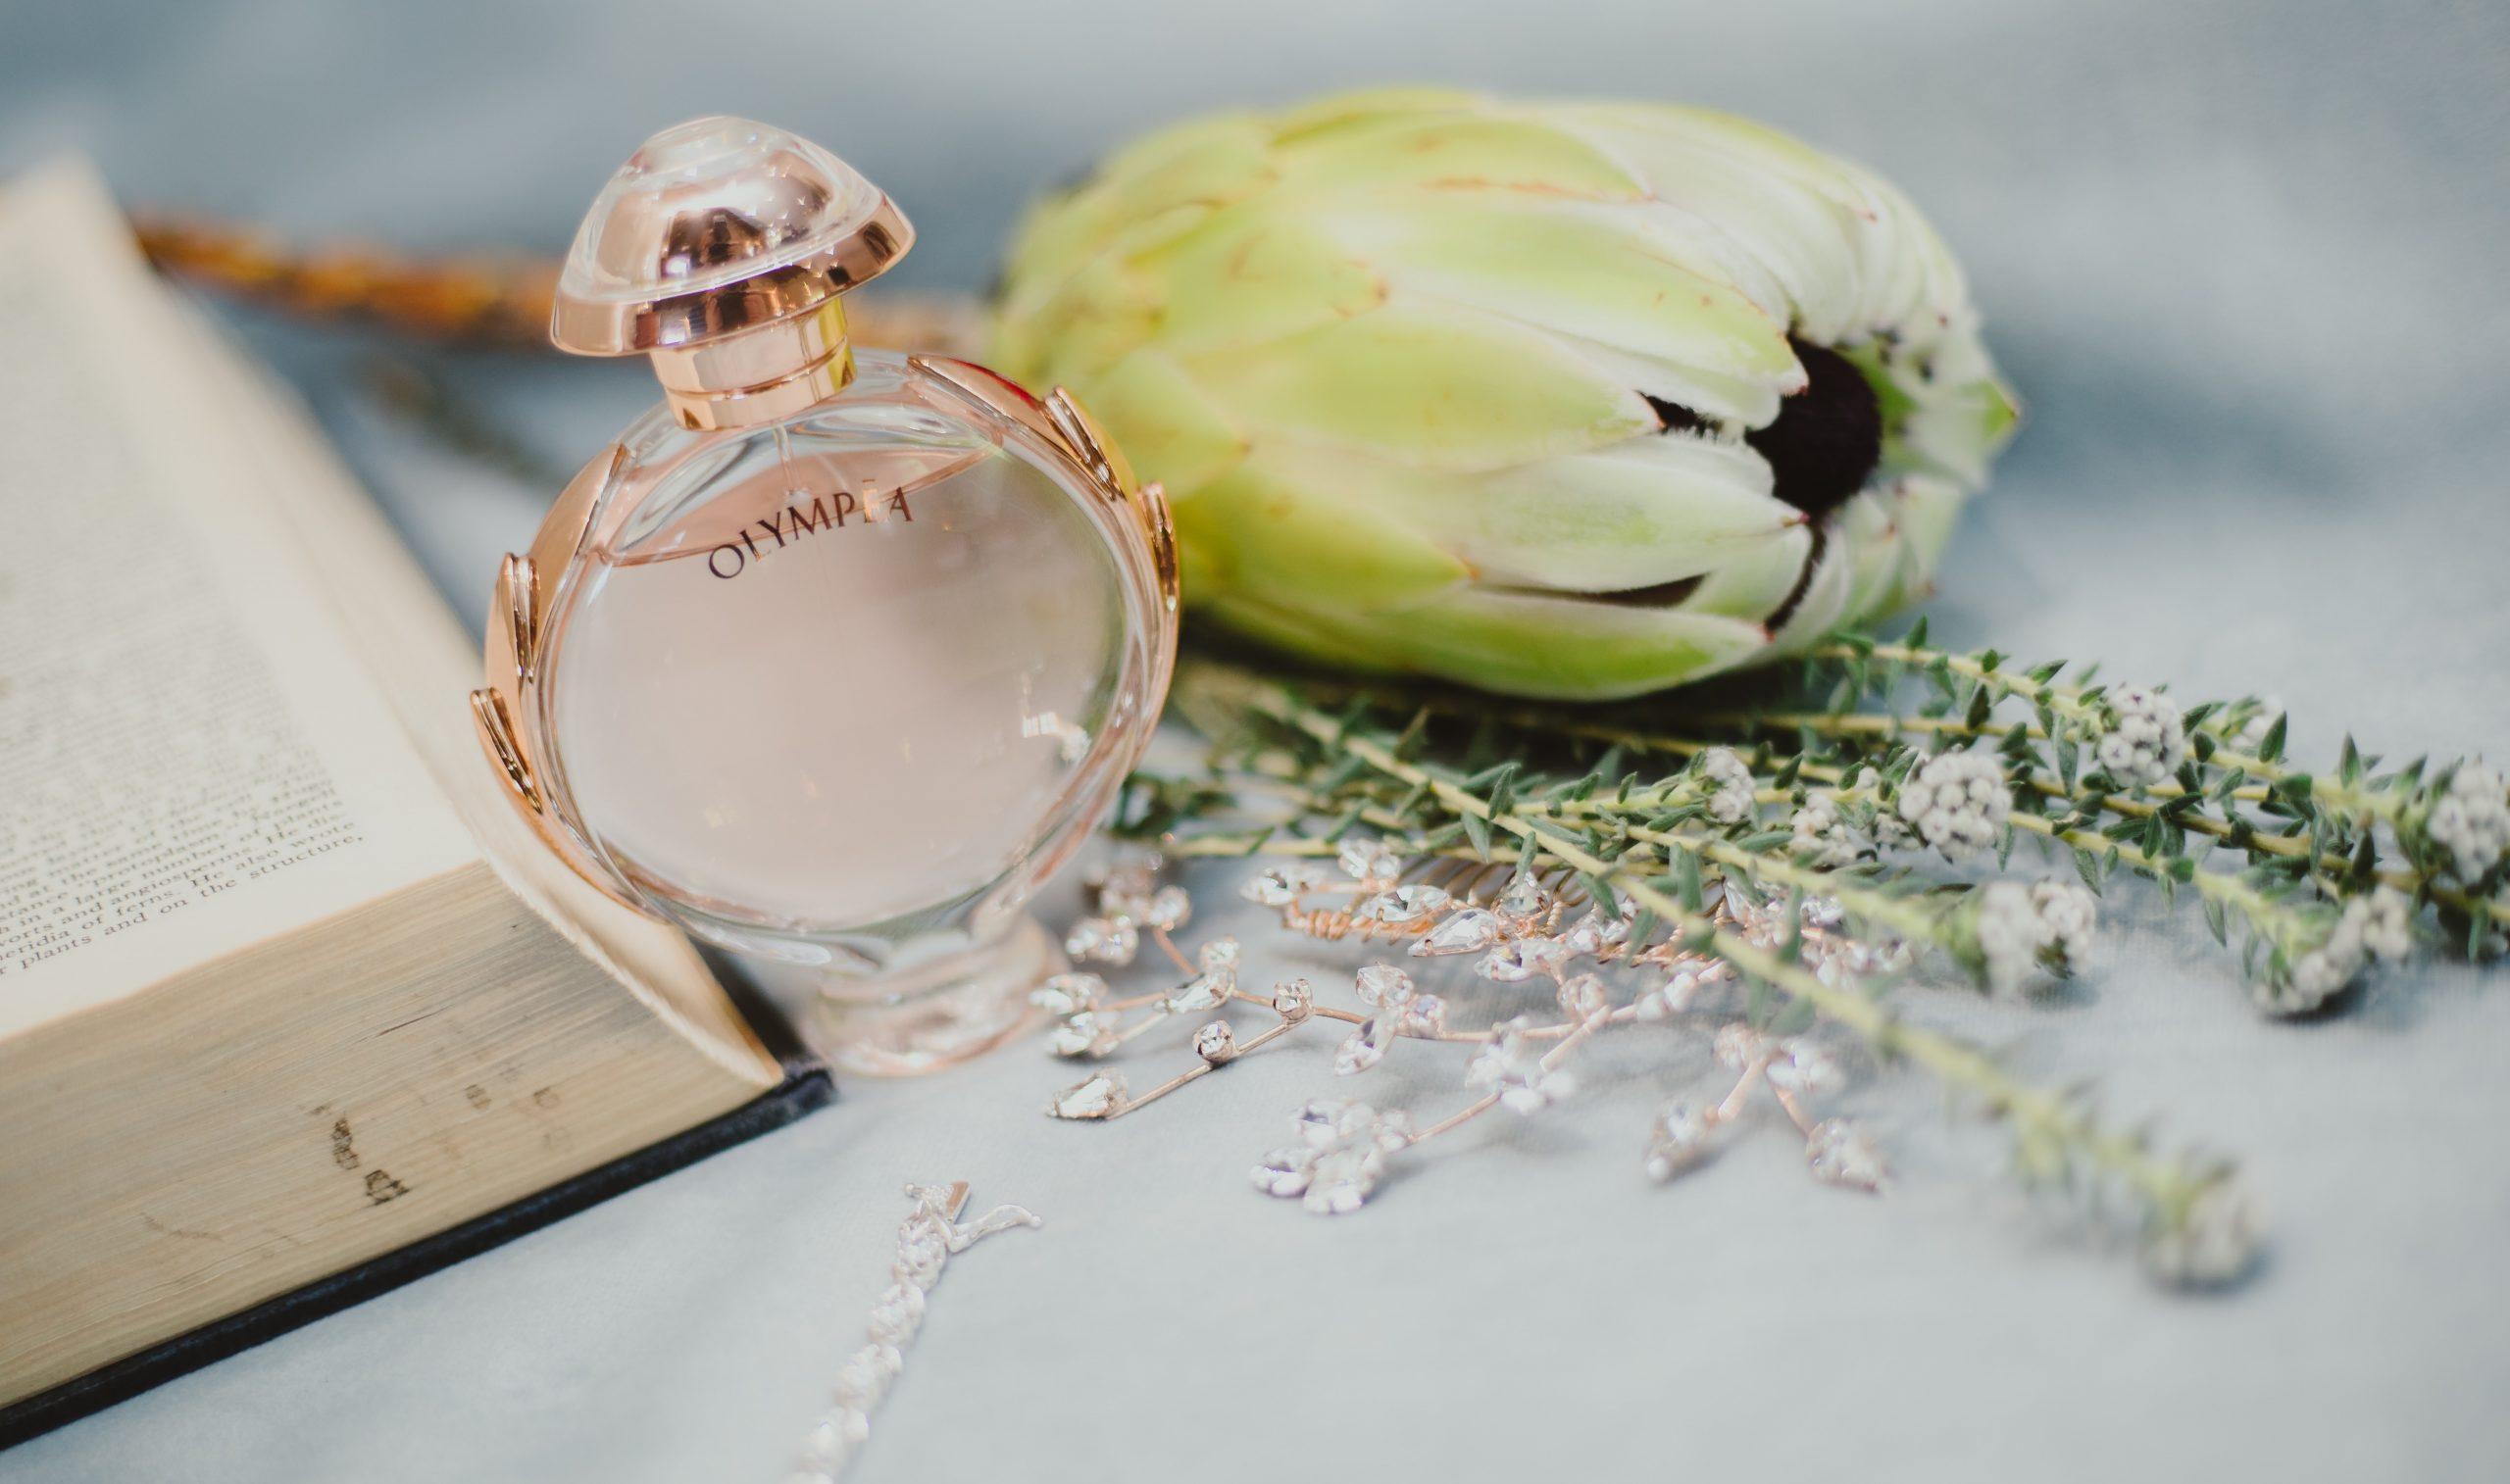 Imagem do perfume Olympéa.